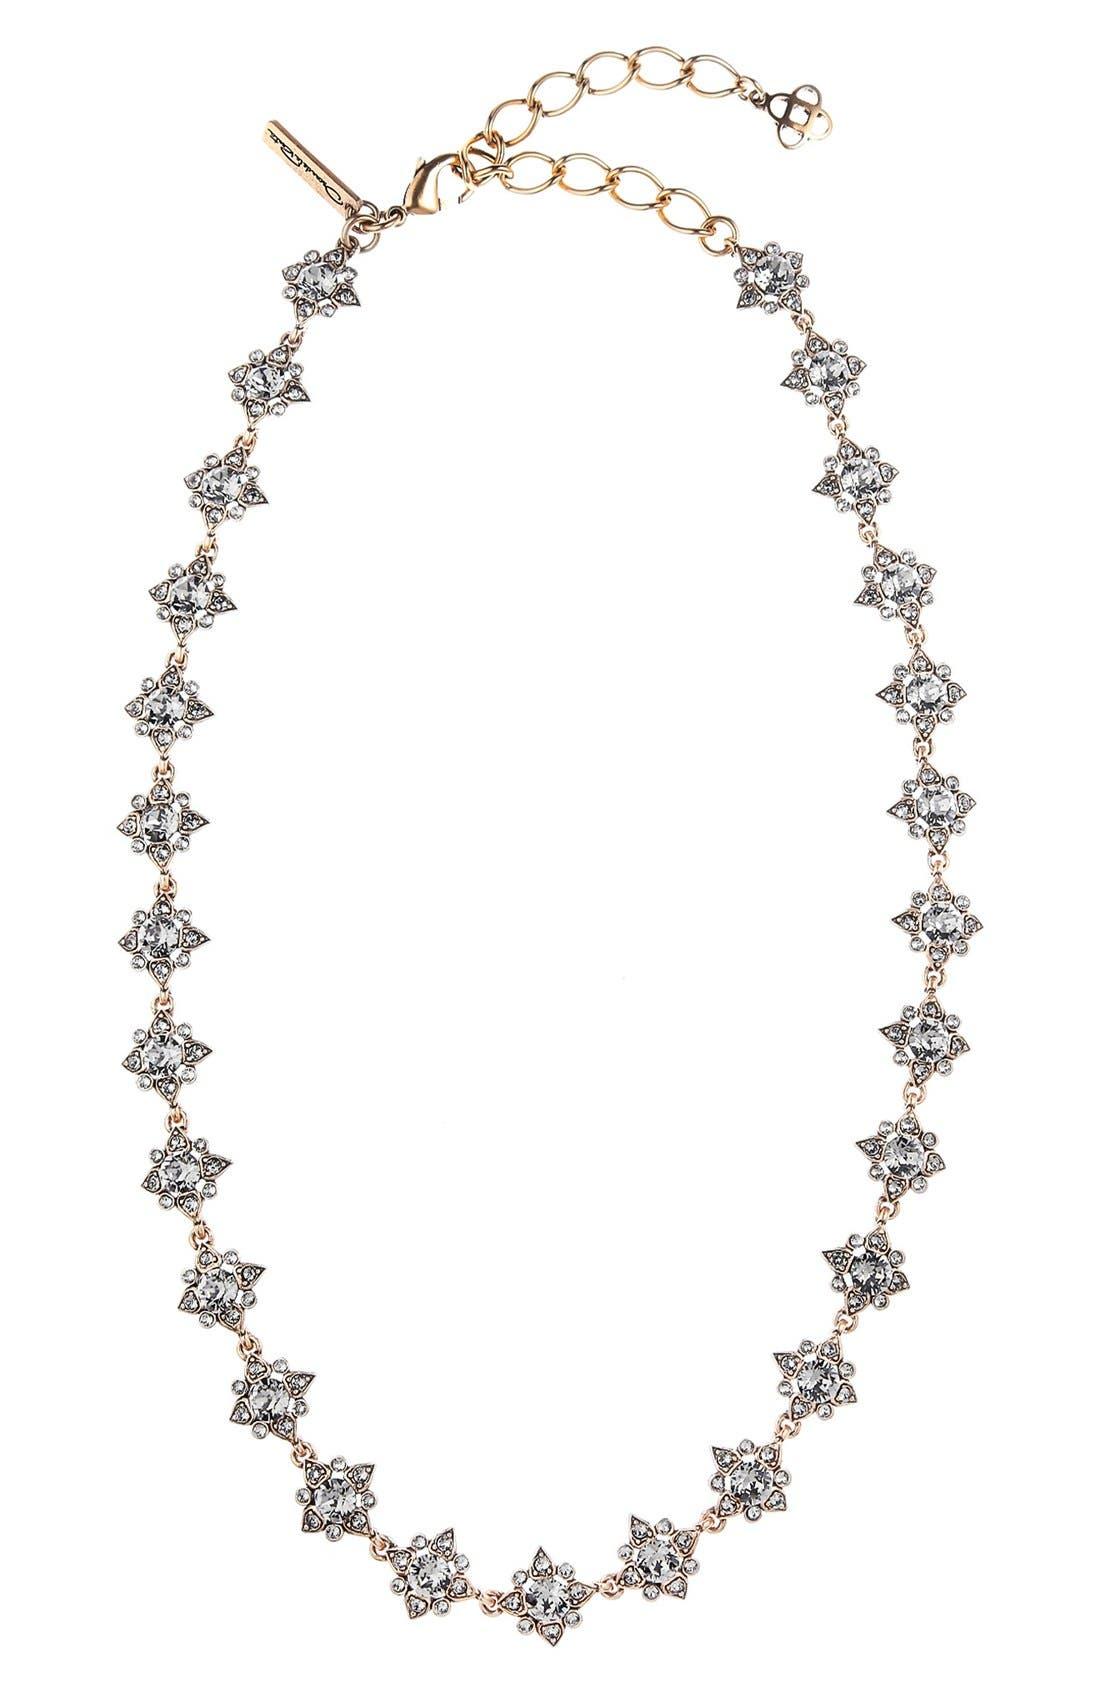 'Delicate Star' Swarovski Crystal Collar Necklace,                         Main,                         color, Black